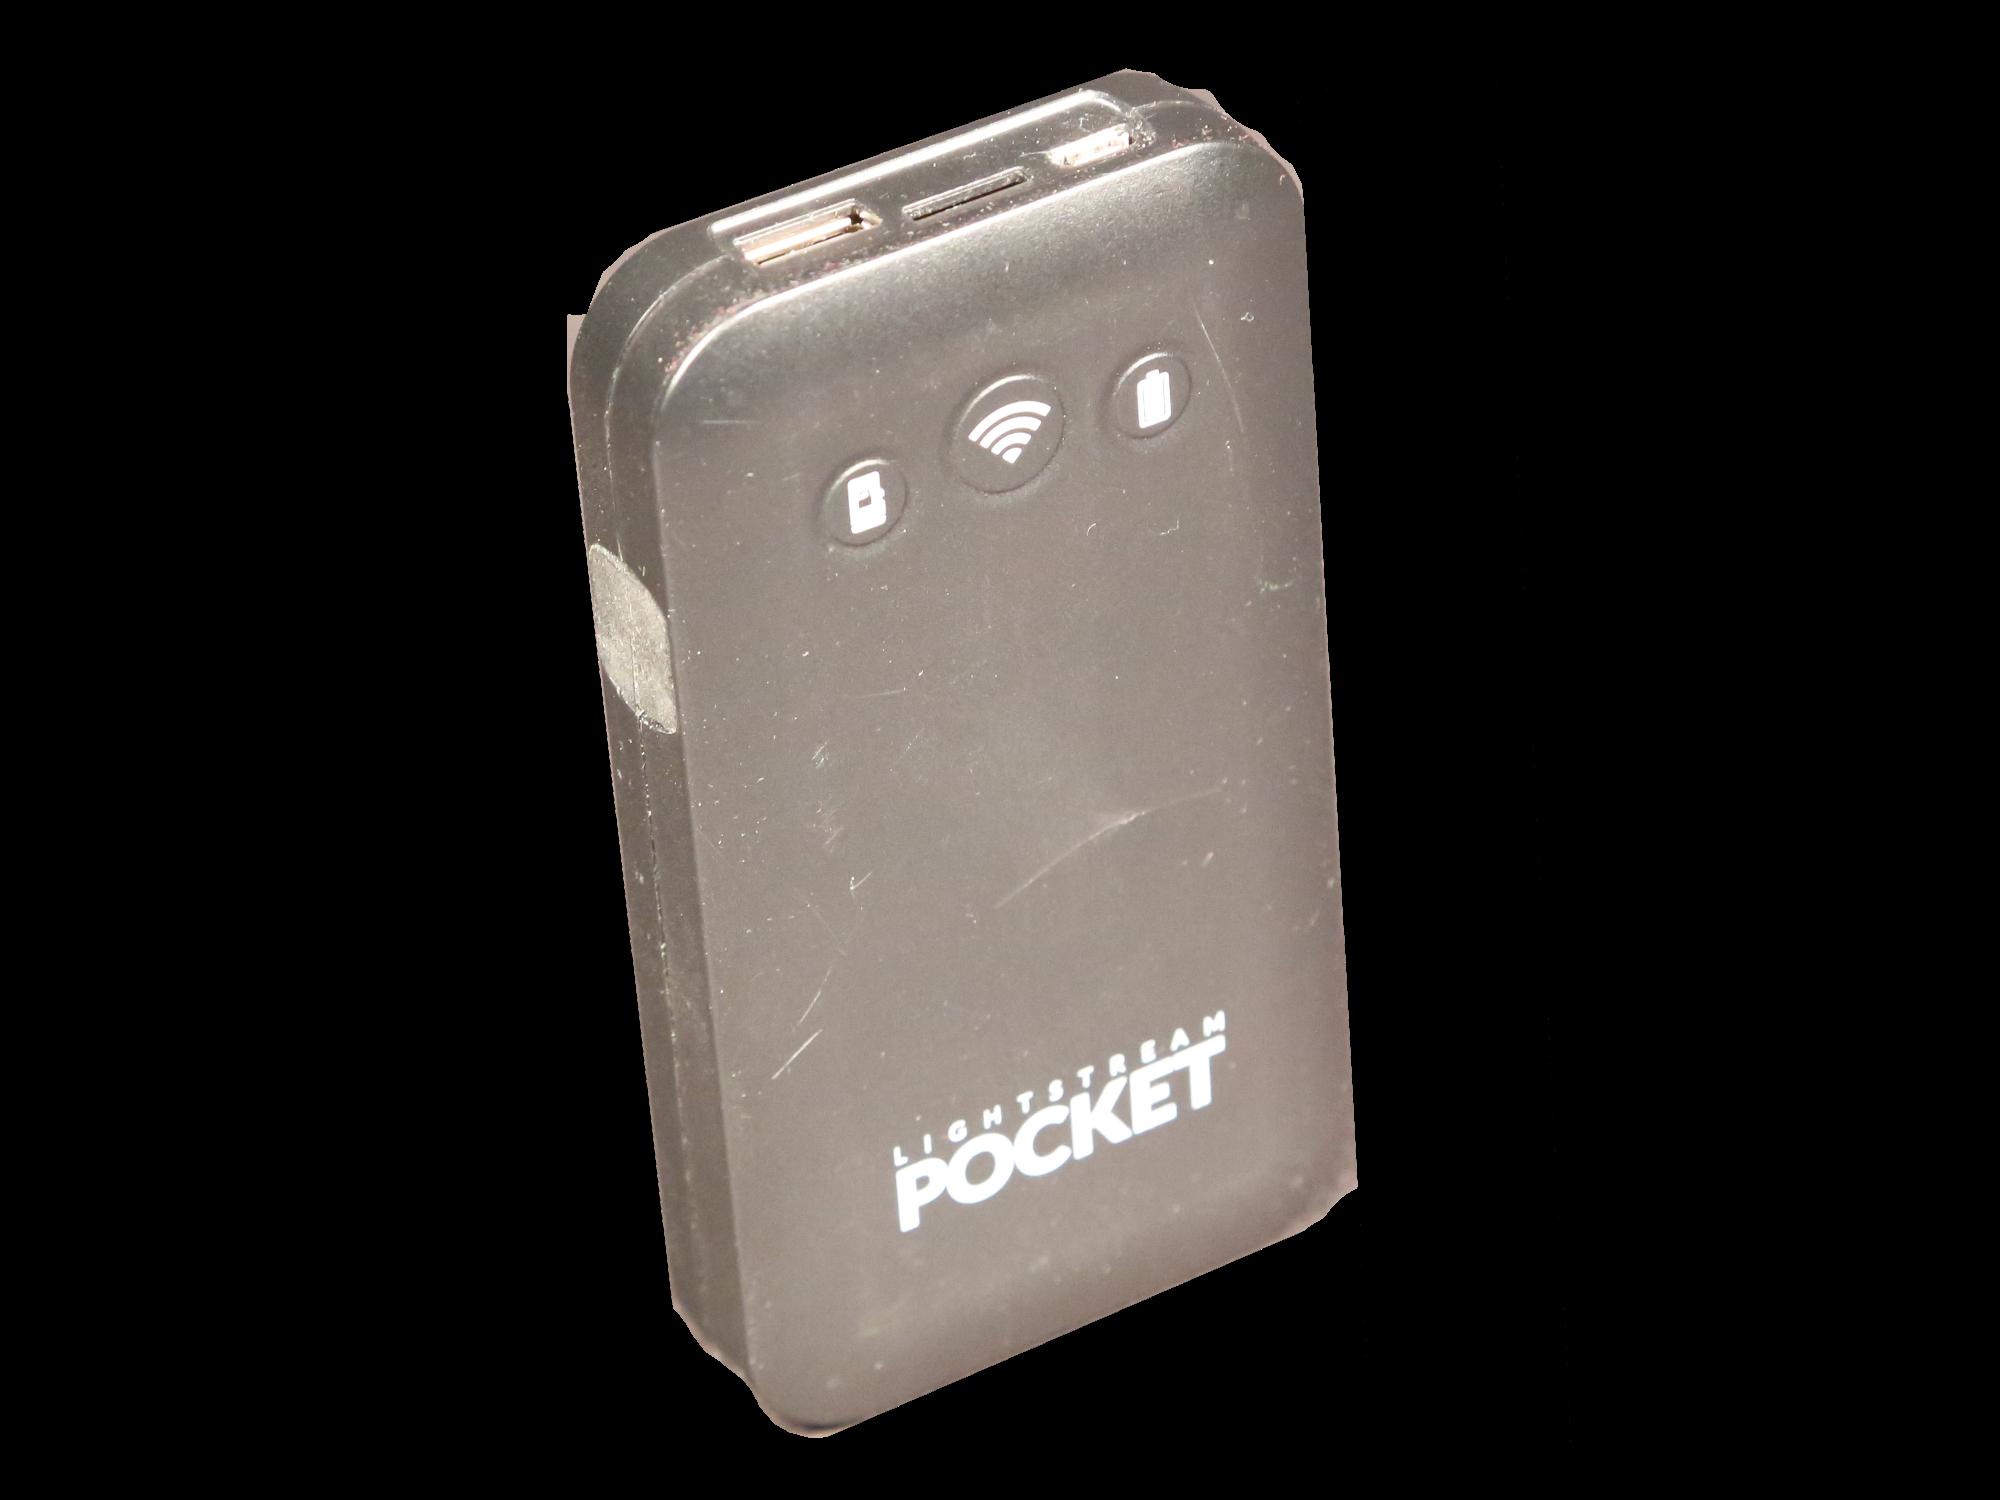 Lightstream Pocket